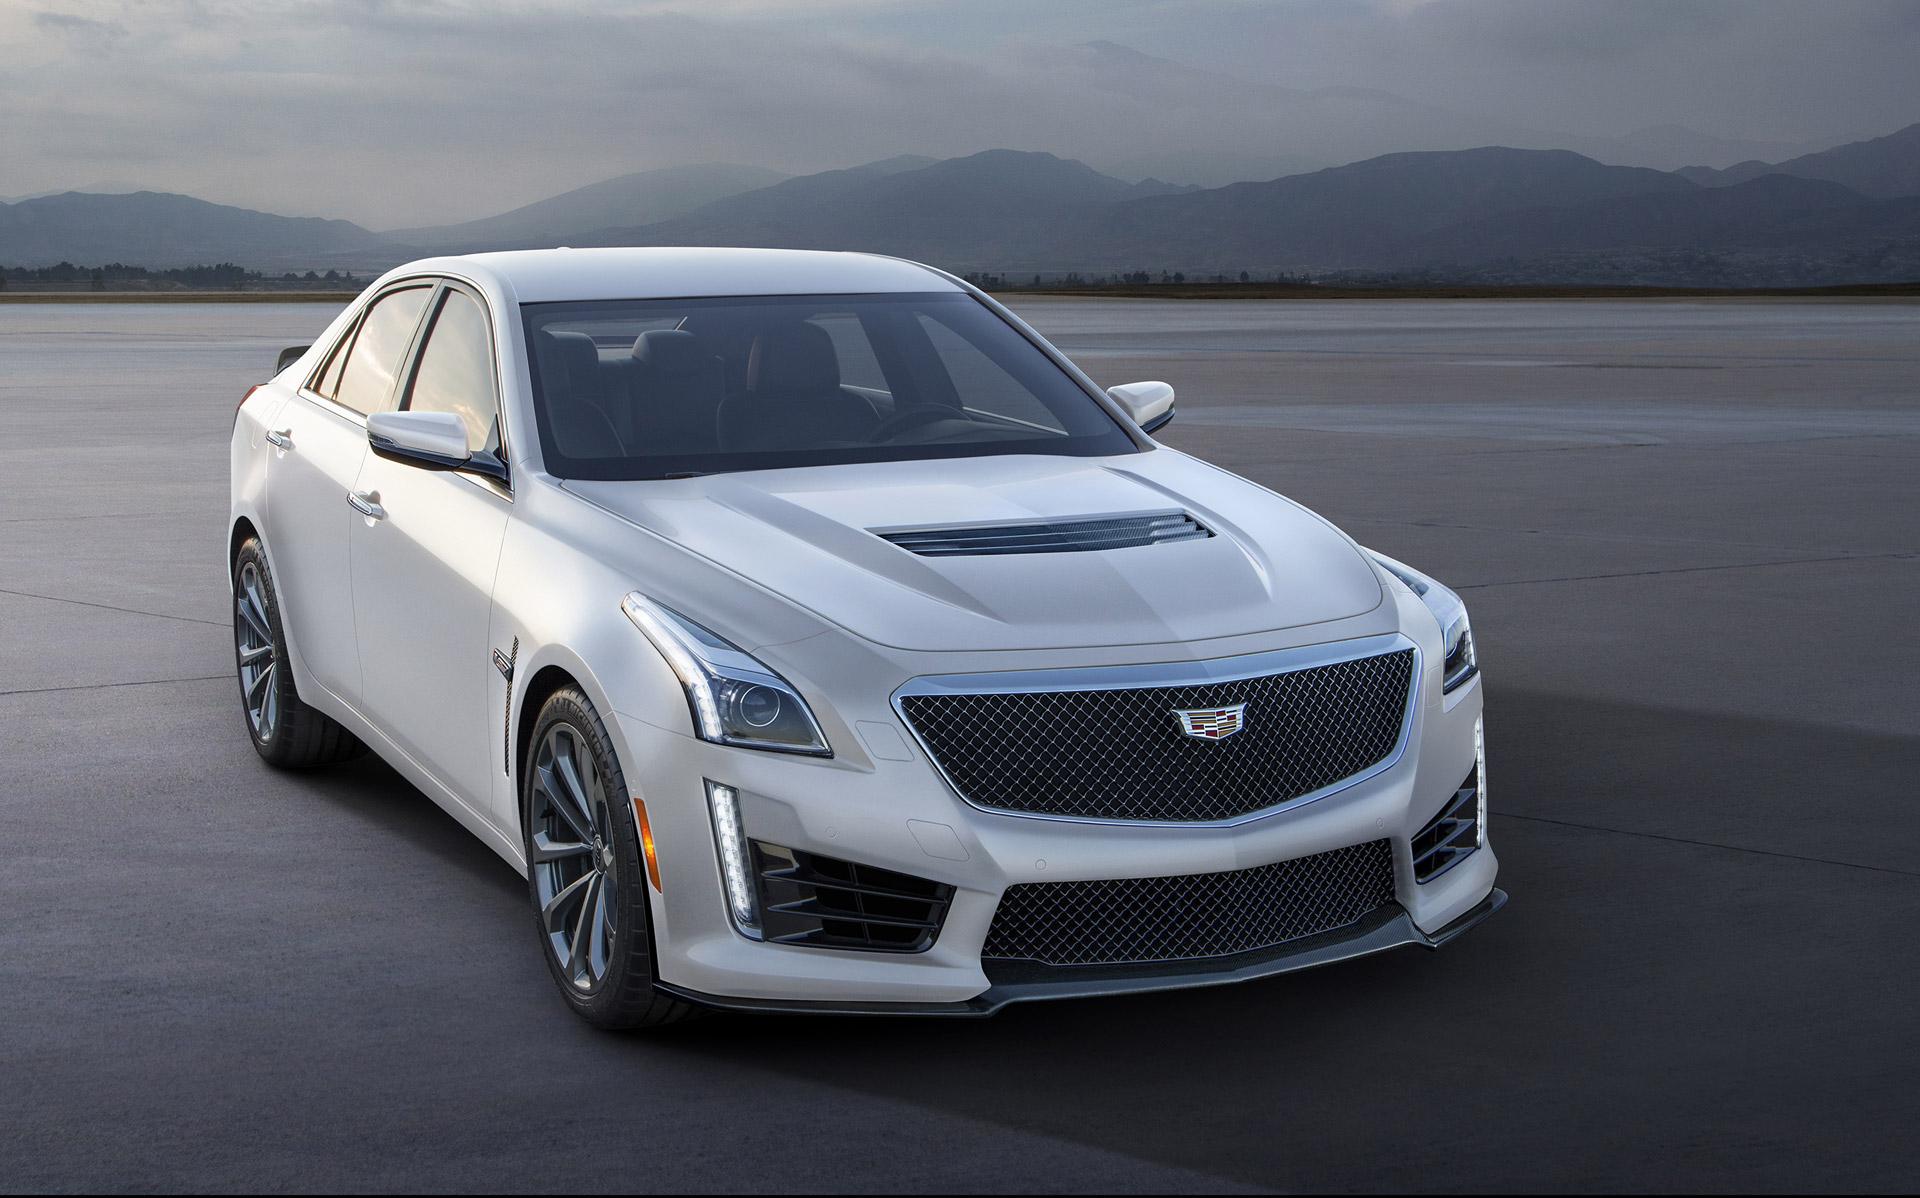 Cadillac Ats V Coupe >> 2016 Cadillac ATS-V And CTS-V Get Matte Finish Special Editions